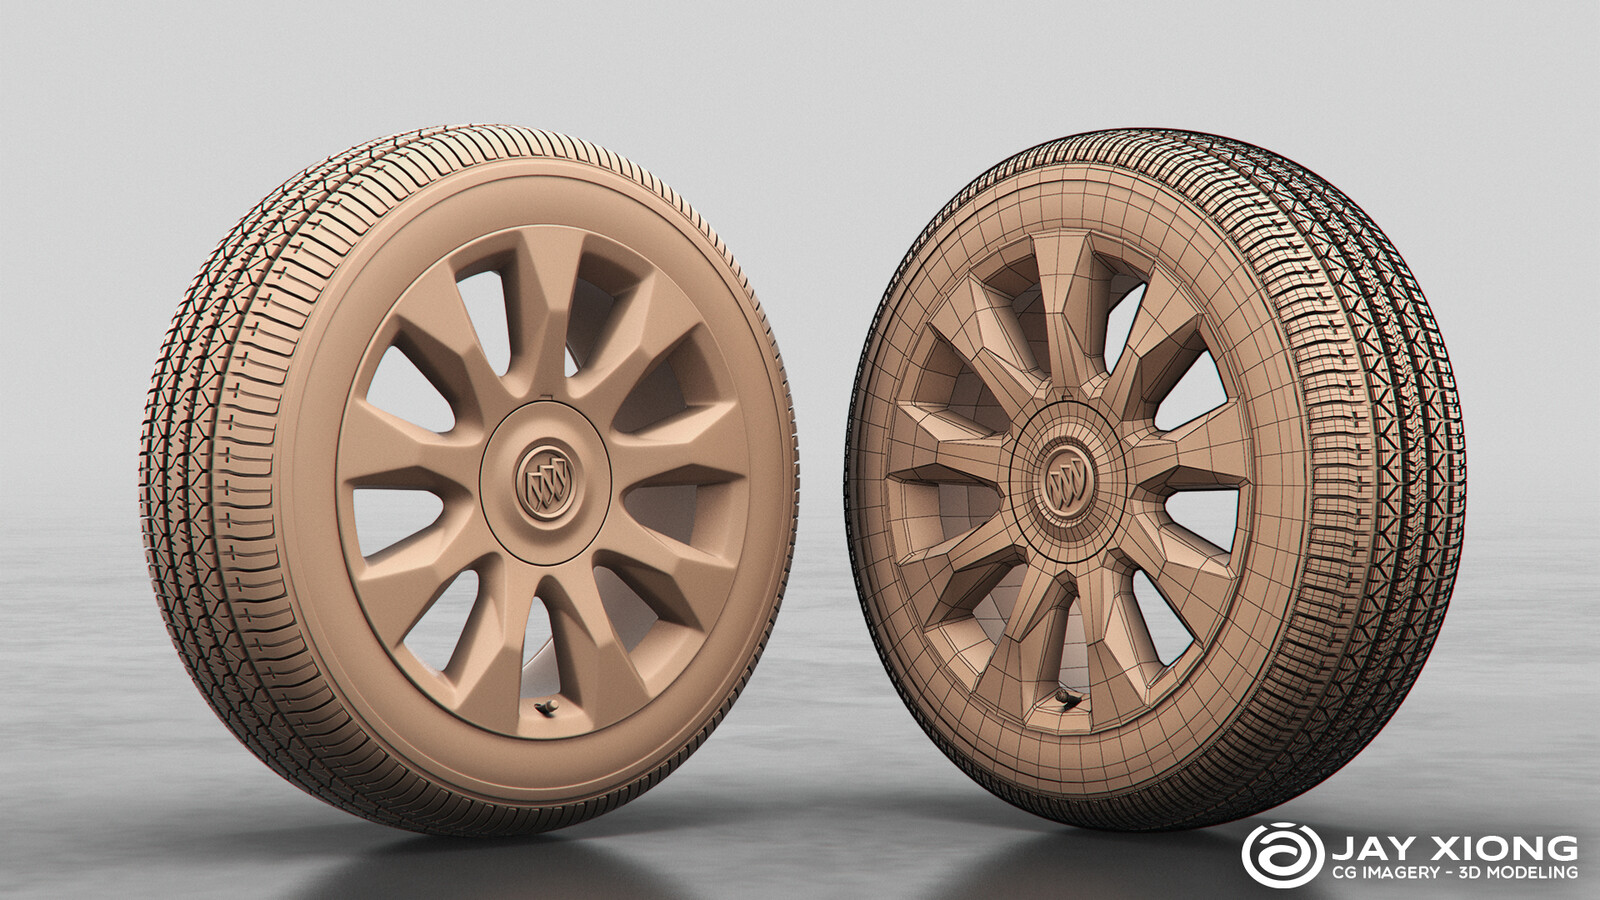 2011 Buick Enclave Wheel & Bridgestone Dueler H/P 92A Tire (Buick logo cap from existing CAD data)